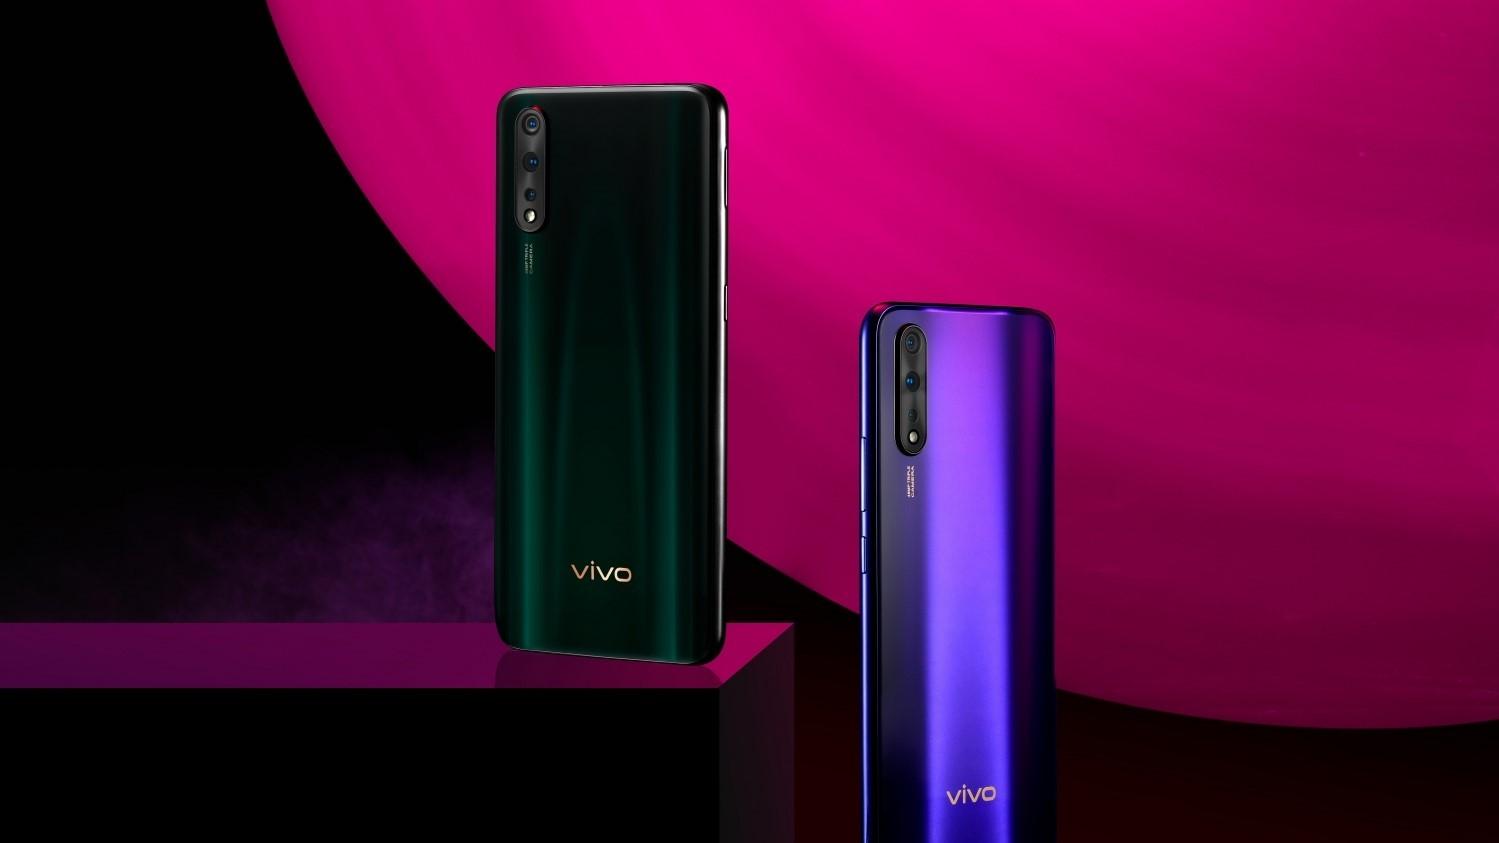 Vivo раскрыла ключевые характеристики смартфона Z5